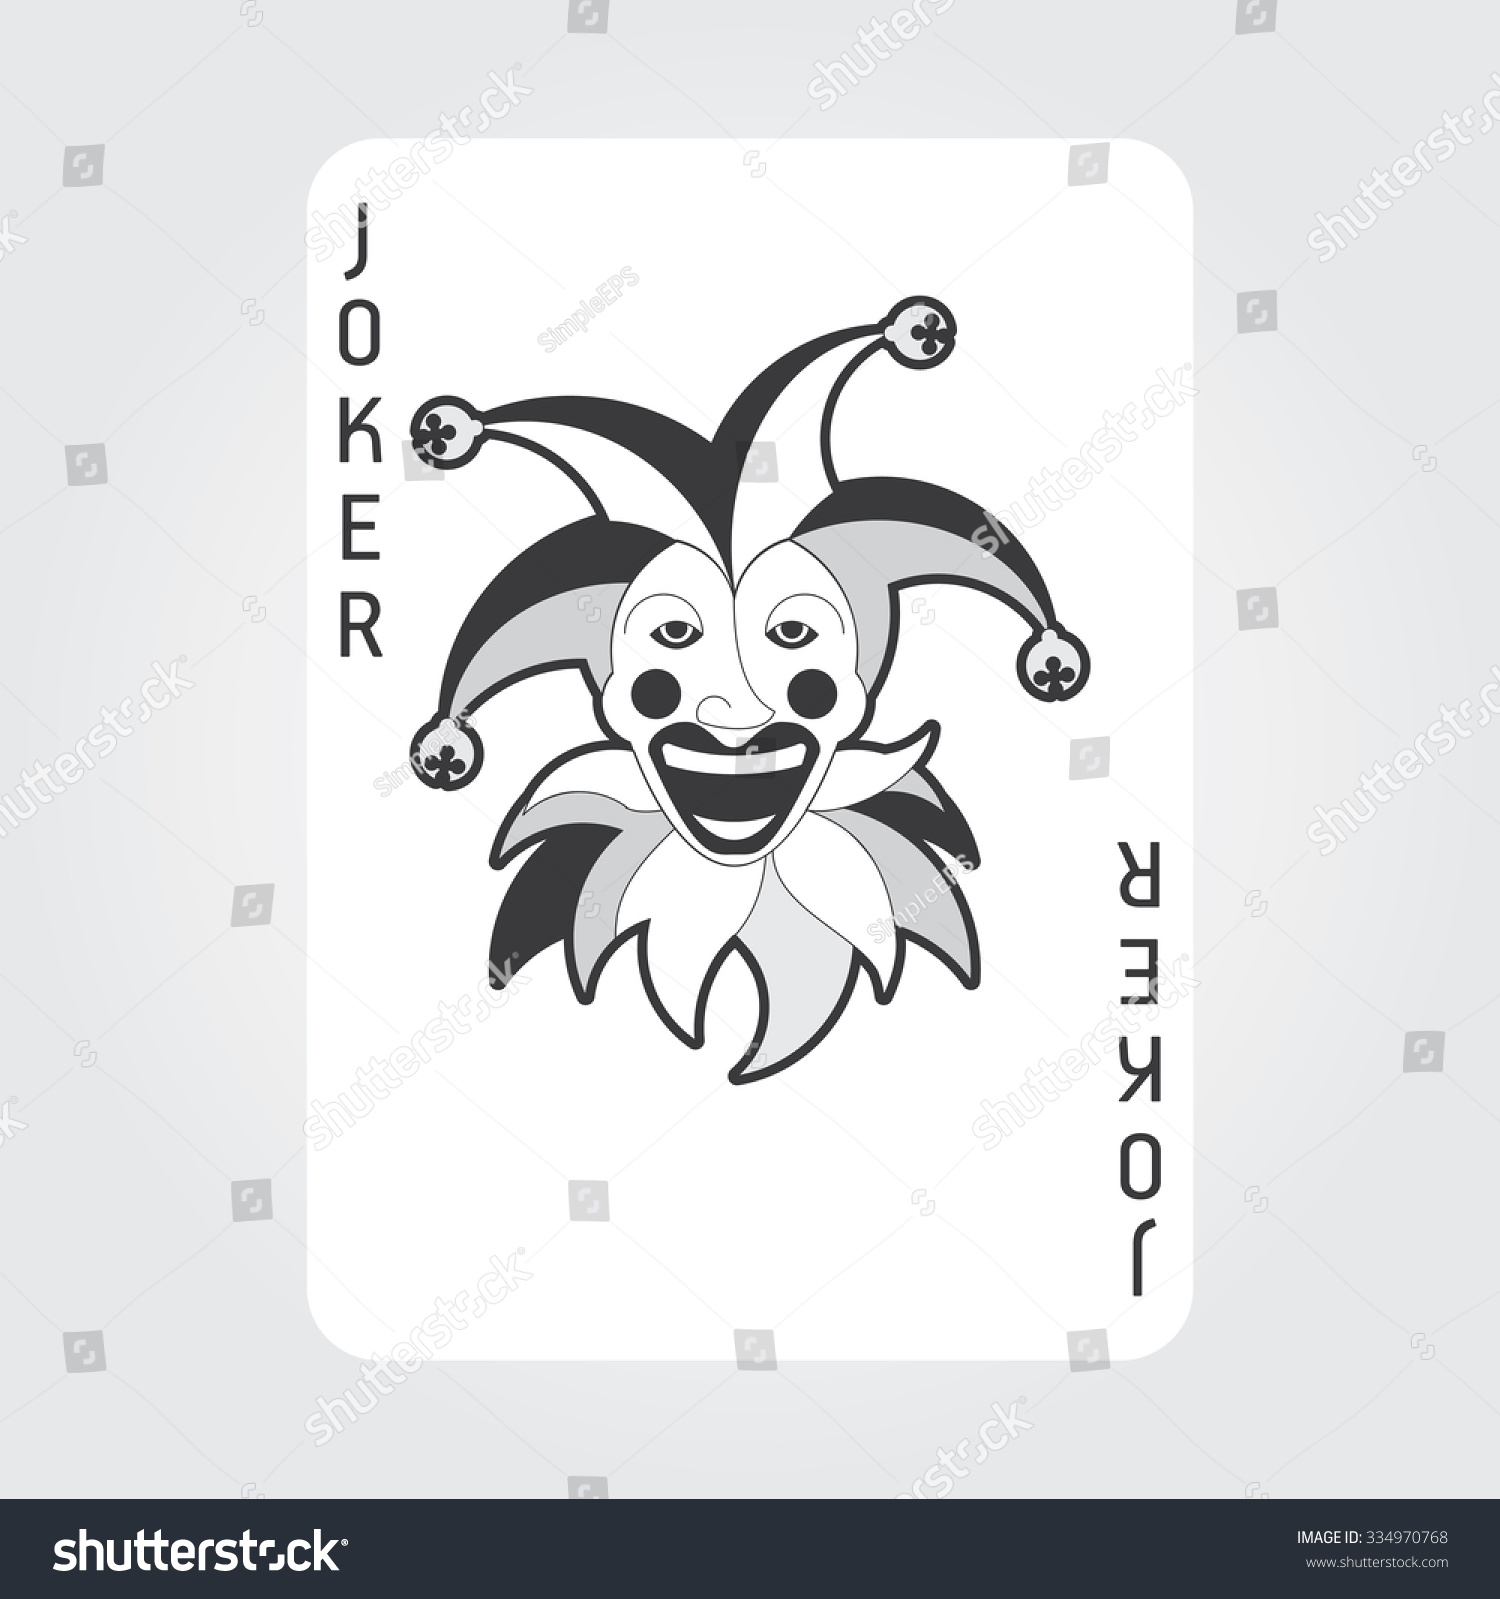 JOKER vector by LEIMARRAMIEL Art Joker Joker art Comics